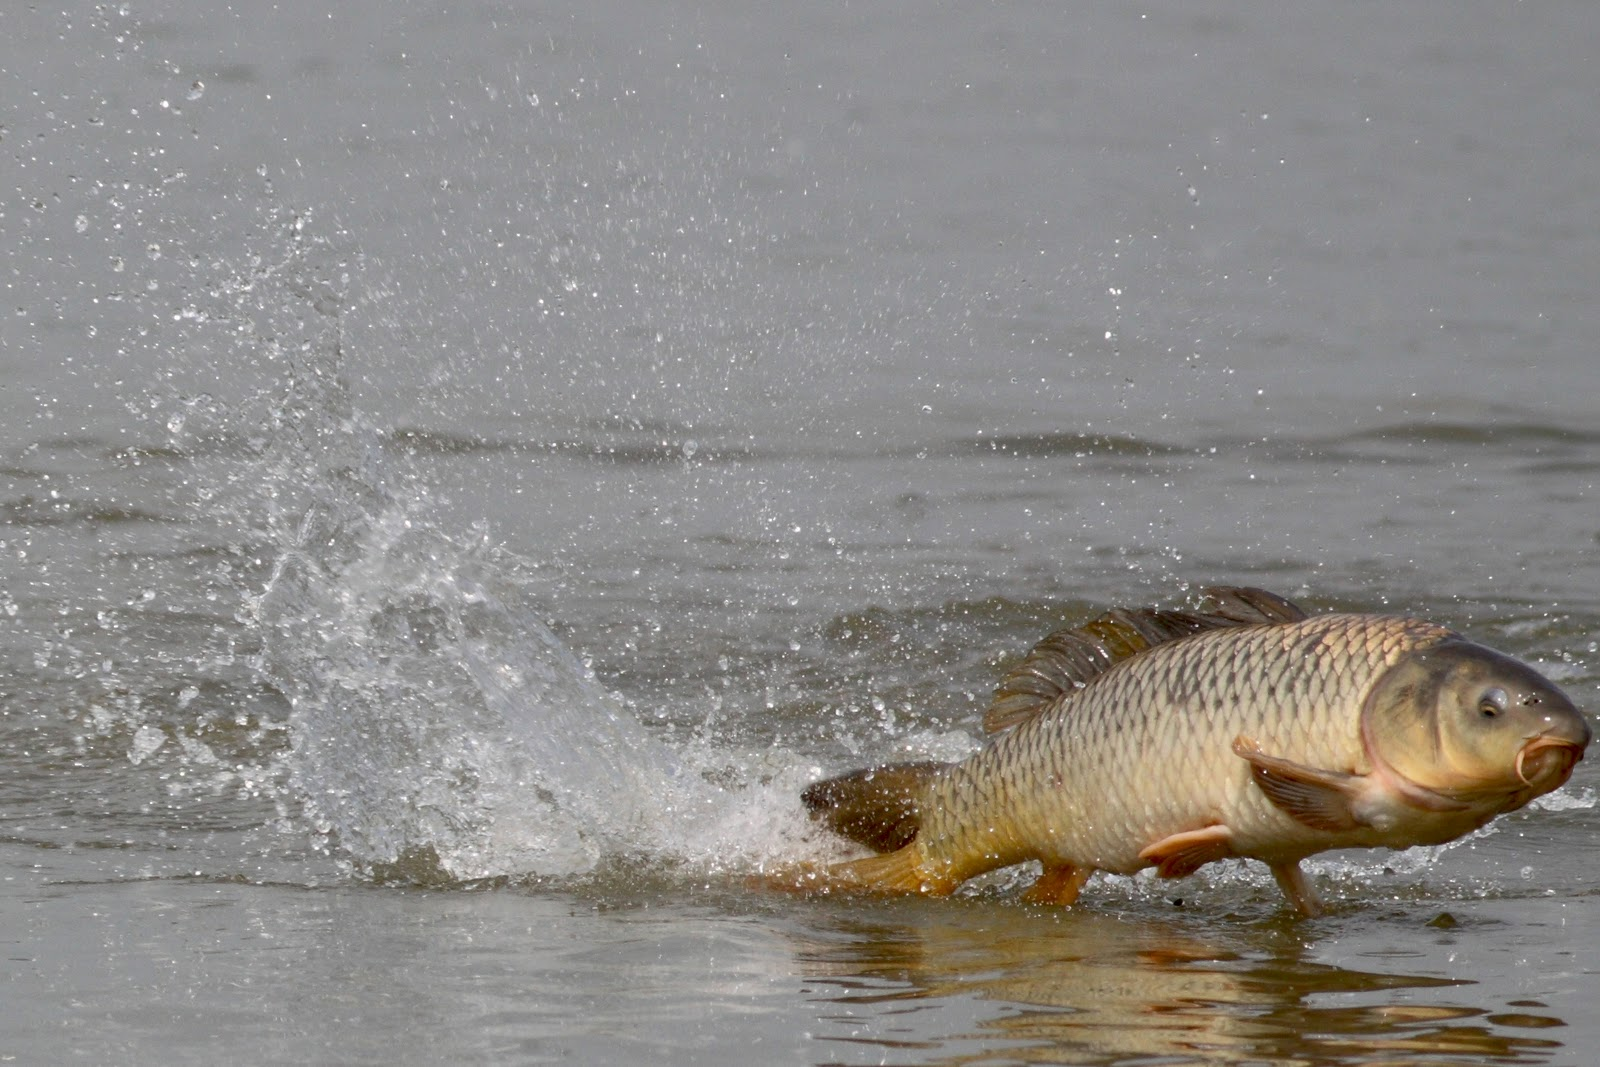 Freshwater fish jumping - Why Do Fish Jump